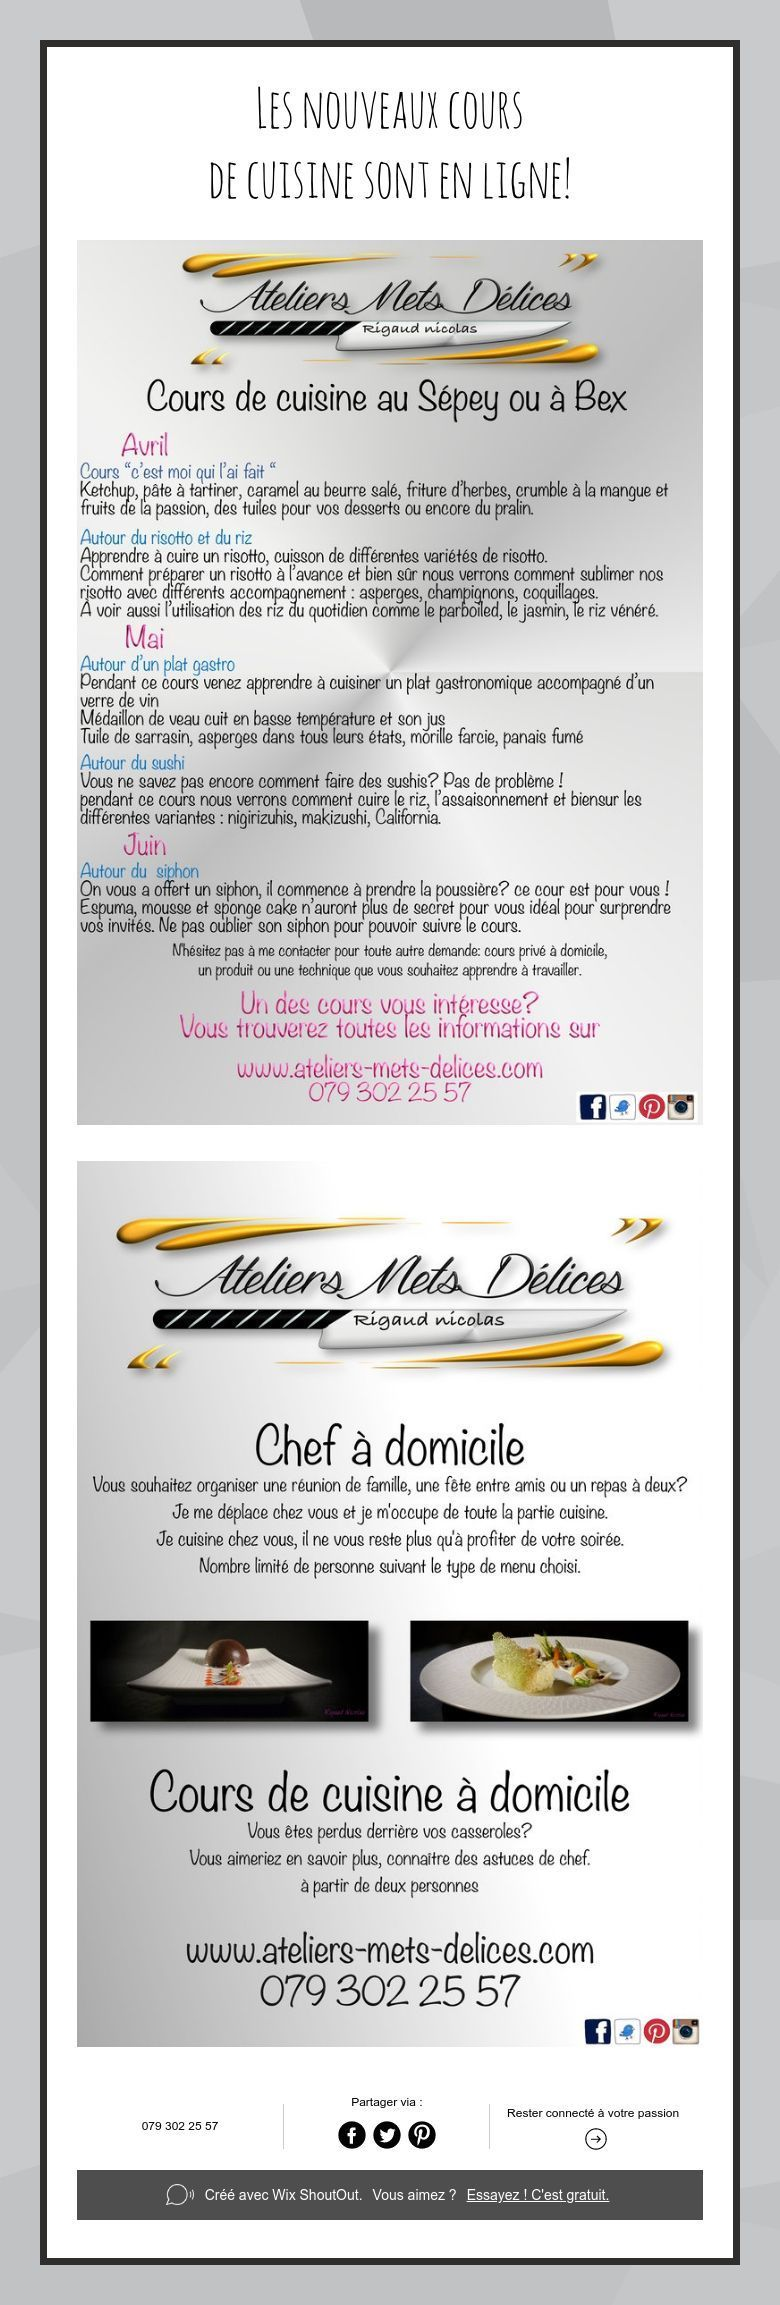 Ateliers Mets Delices Ateliersmetsdel Sur Pinterest